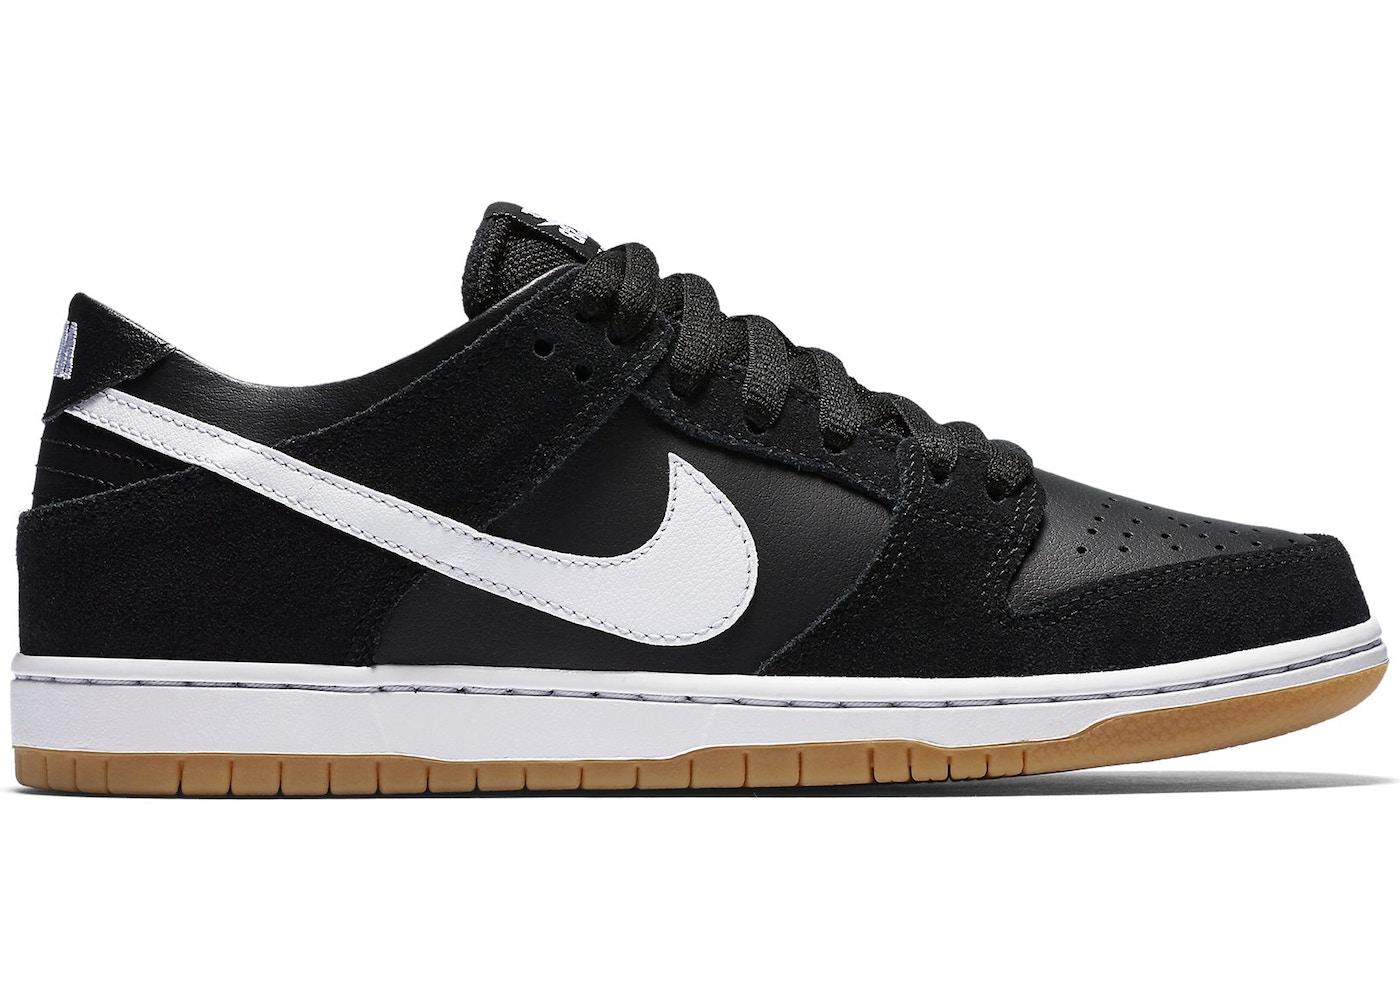 c034f266da86 Buy Nike SB SB Dunk Low Shoes   Deadstock Sneakers